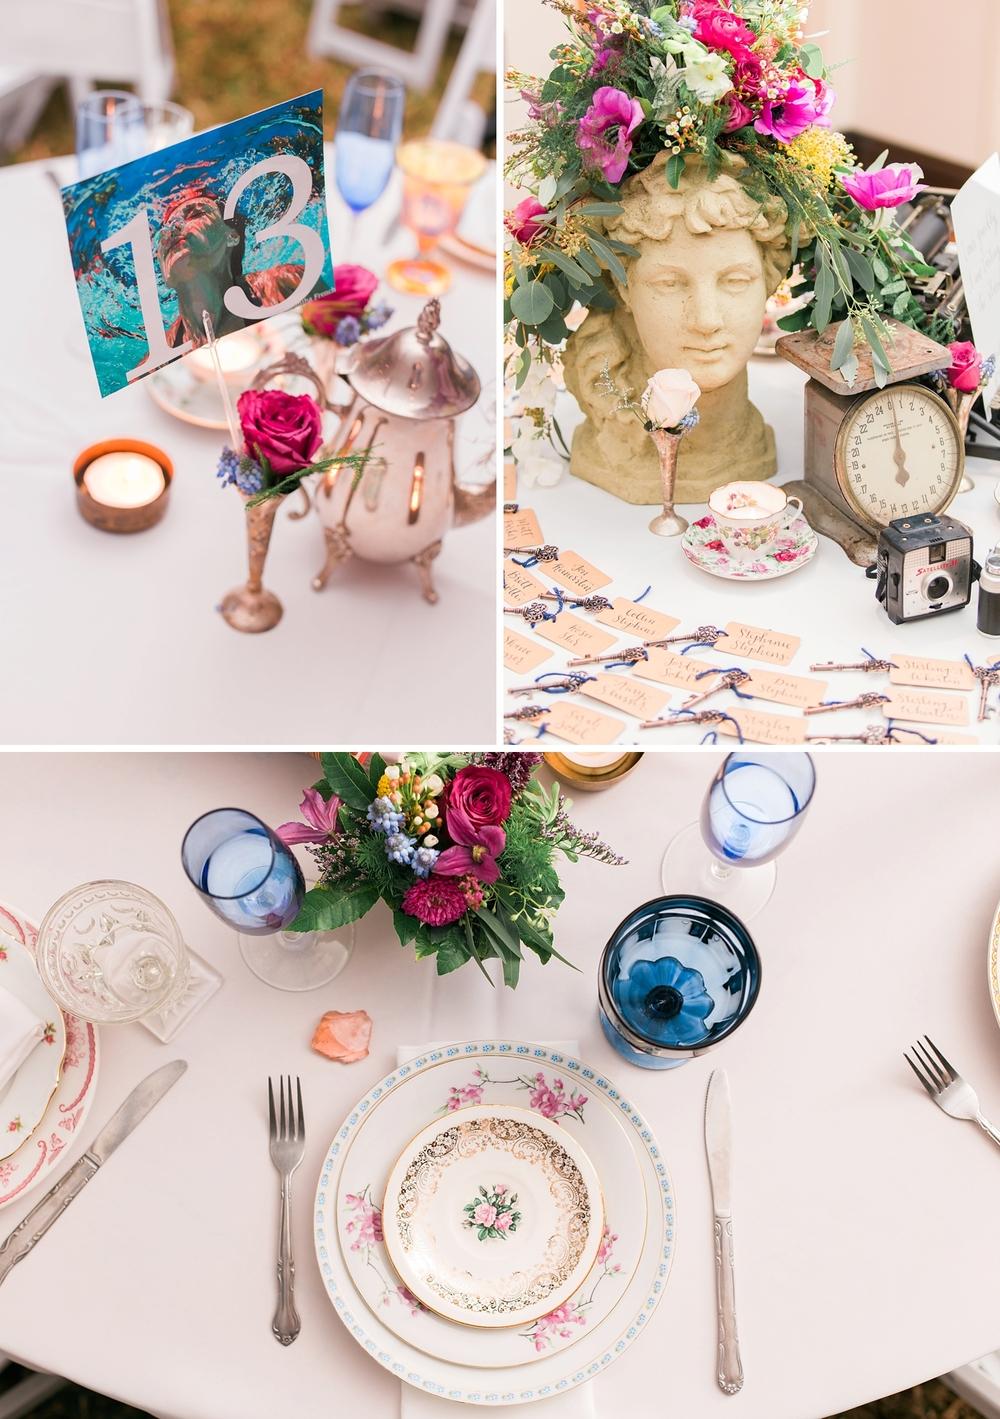 orlando-wedding-photography-justin-gilbert-tampa-sunken-gardens_0011.jpg